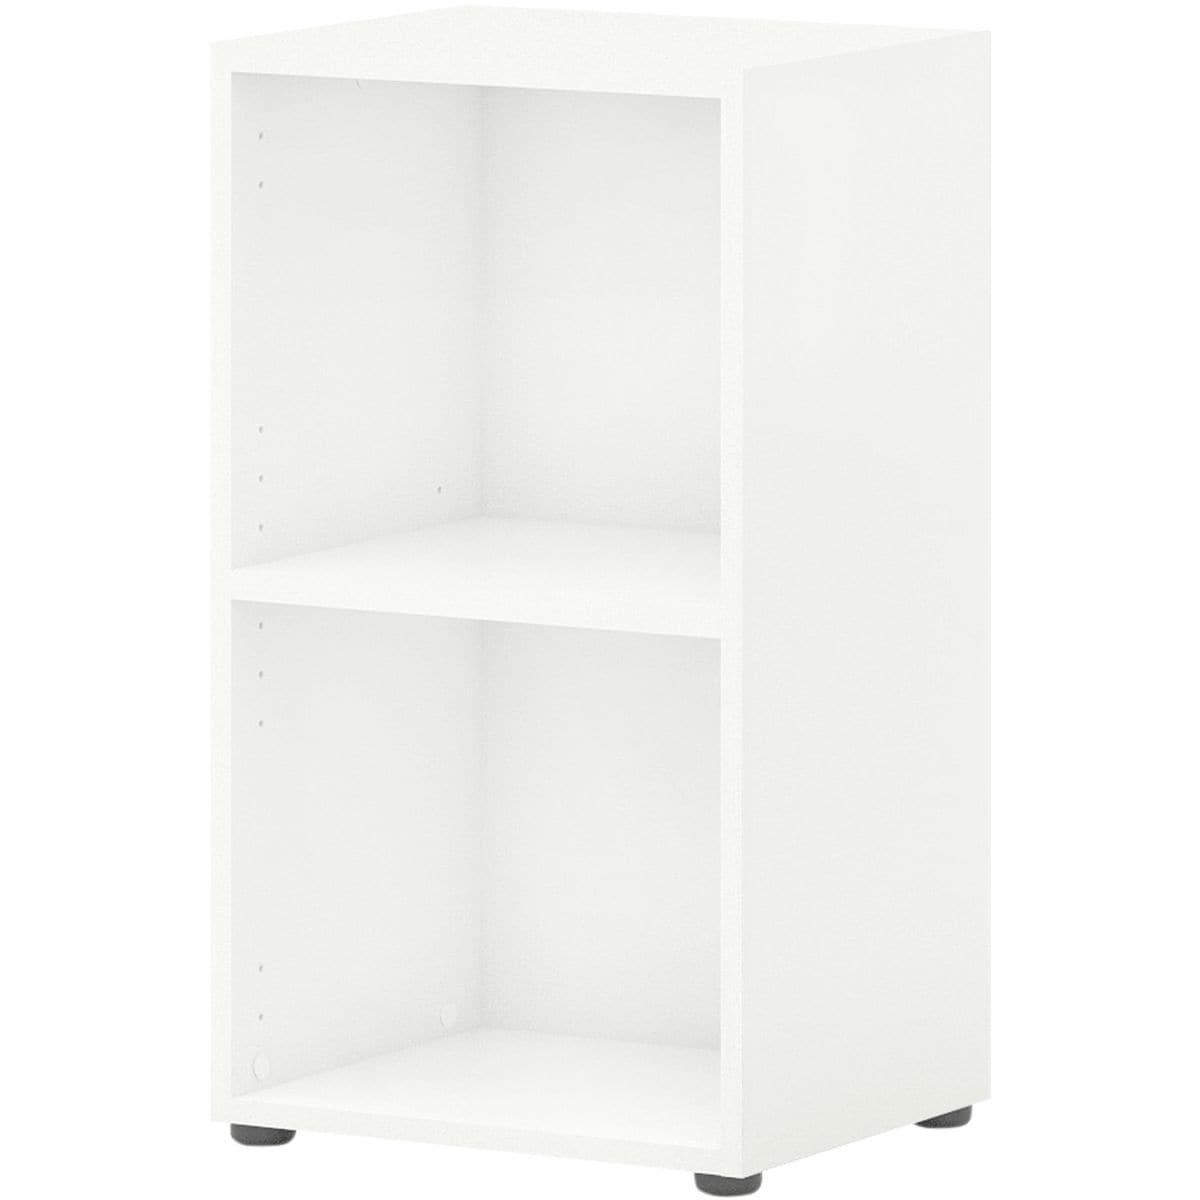 r hr regal direct office 2 40 cm schmal 2 oh bei otto office g nstig kaufen. Black Bedroom Furniture Sets. Home Design Ideas